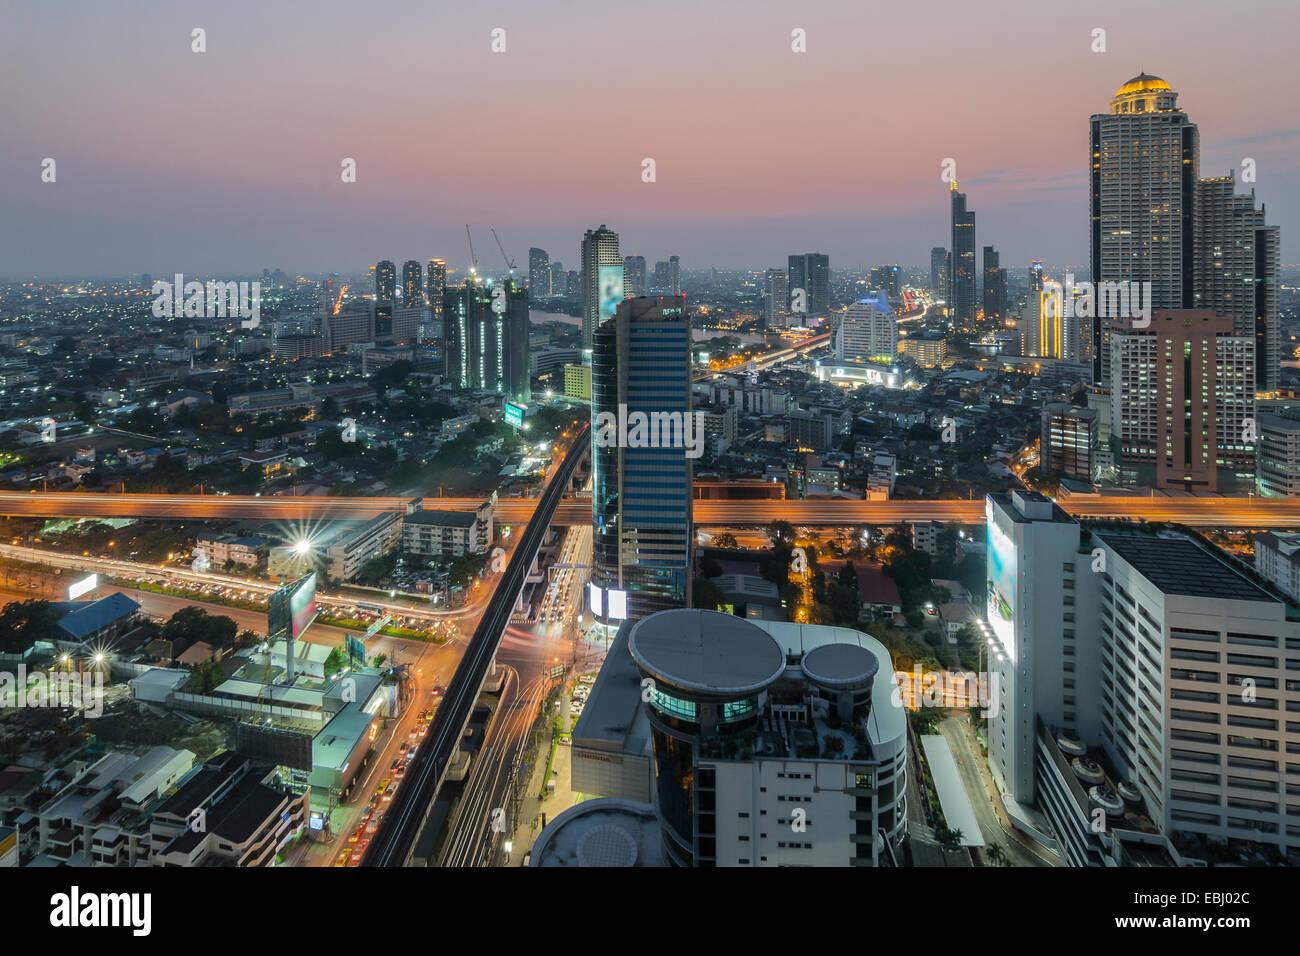 Ville moderne, Sathon Road, Bangkok, Thaïlande Photo Stock